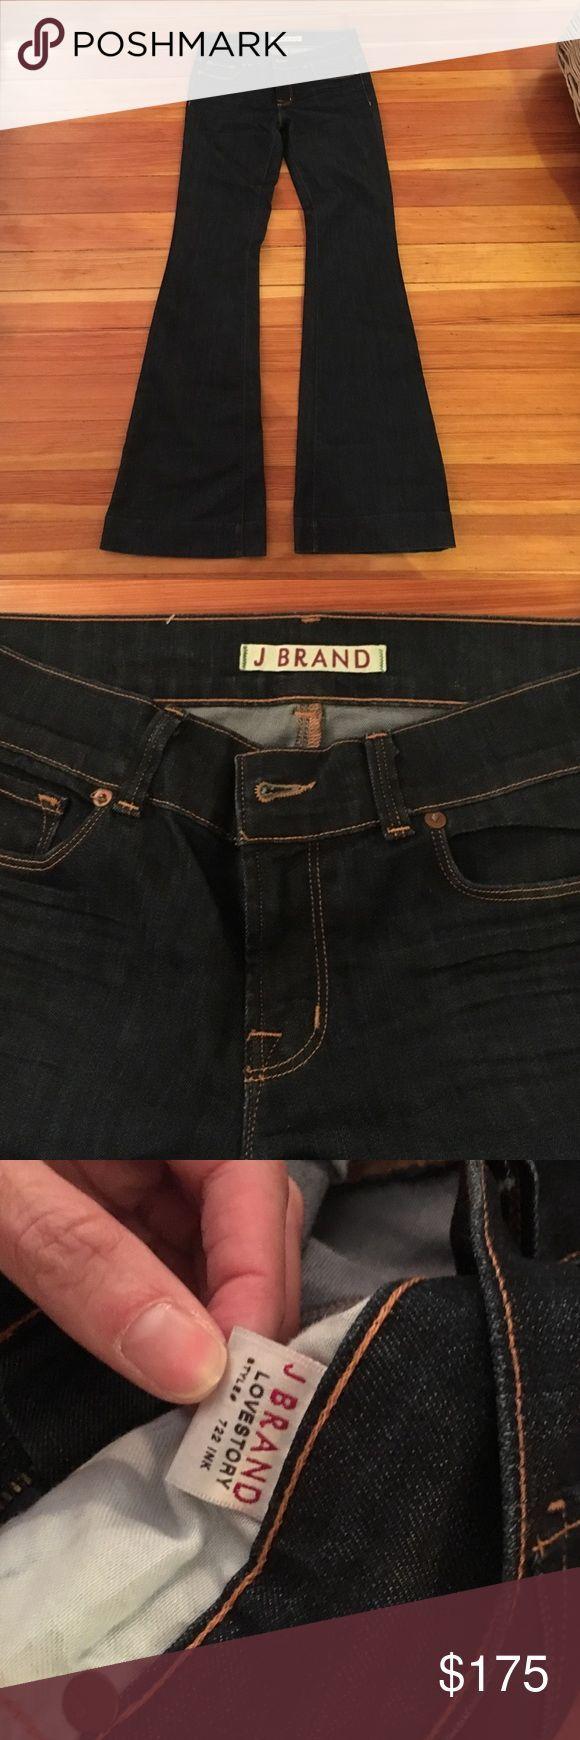 J brand Lovestory J Brand Lovestory flares in Ink. Never warn J Brand Jeans Flare & Wide Leg